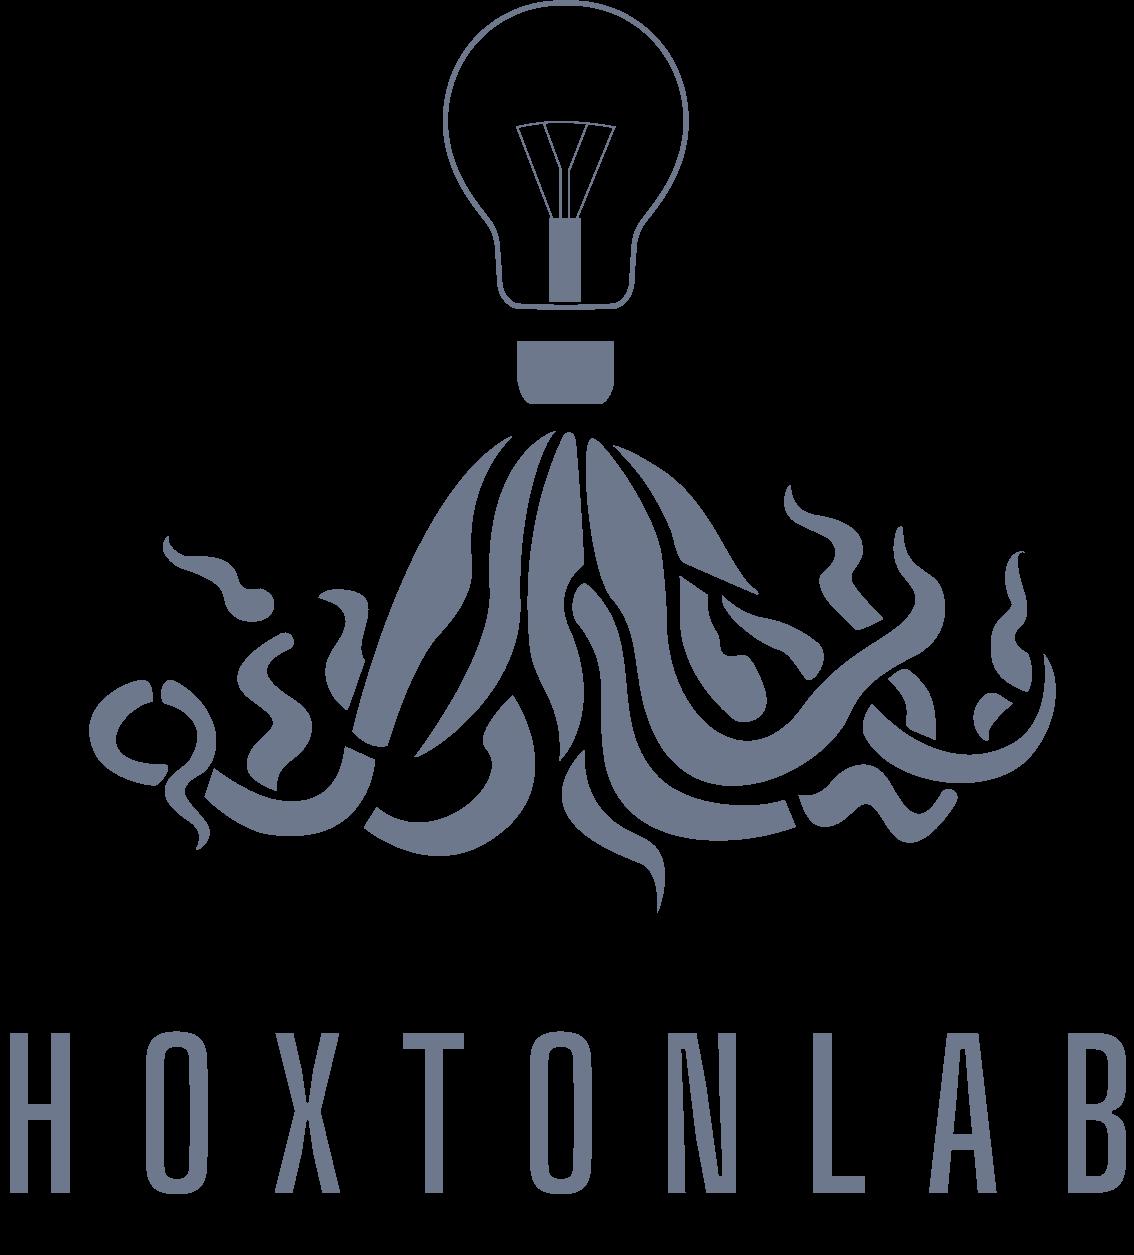 Hoxtonlab